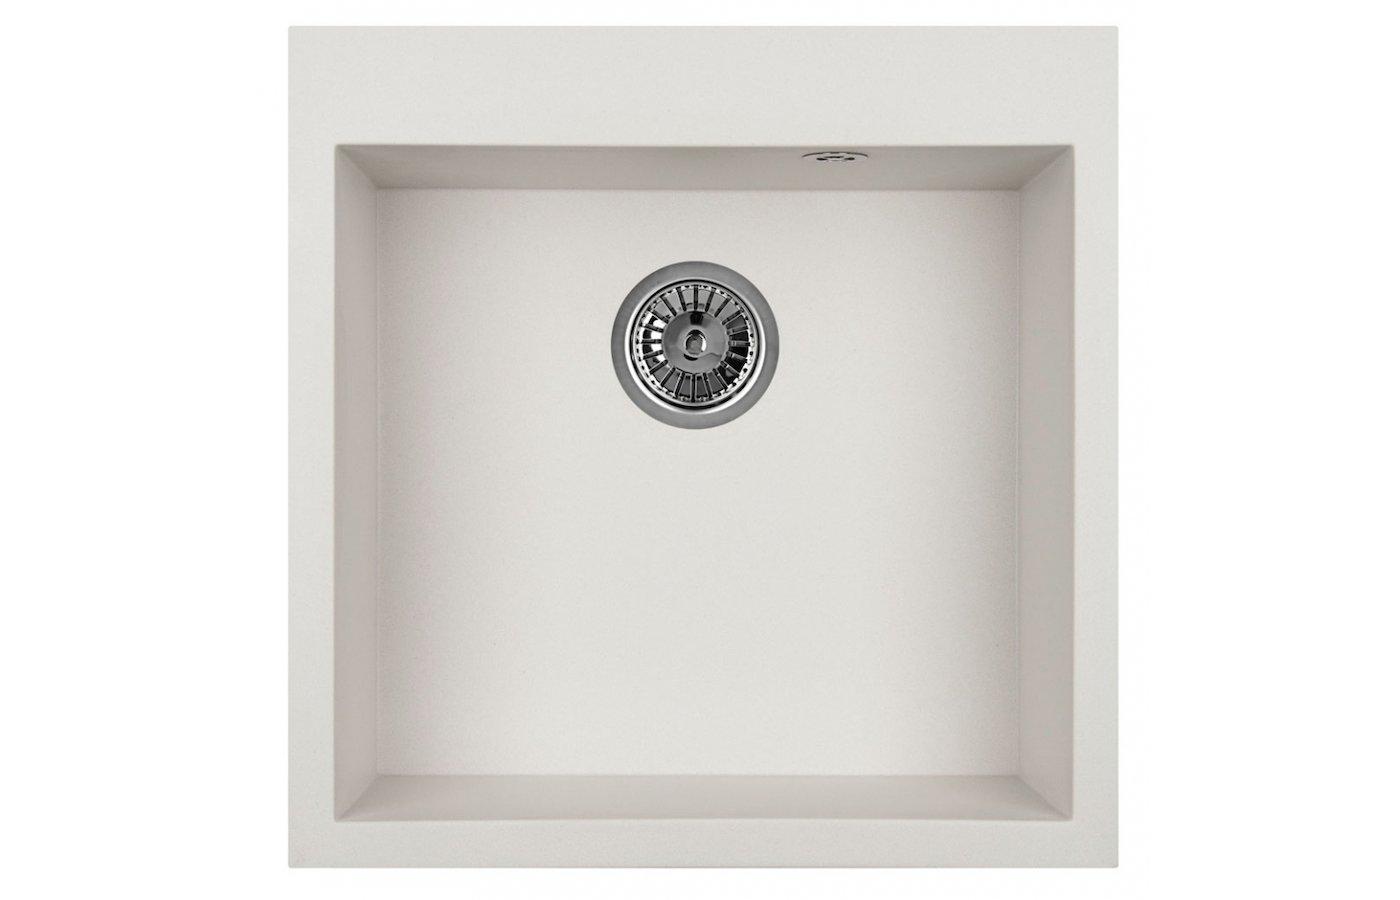 Кухонная мойка Weissgauff QUADRO 505 Eco Granit серый шелк